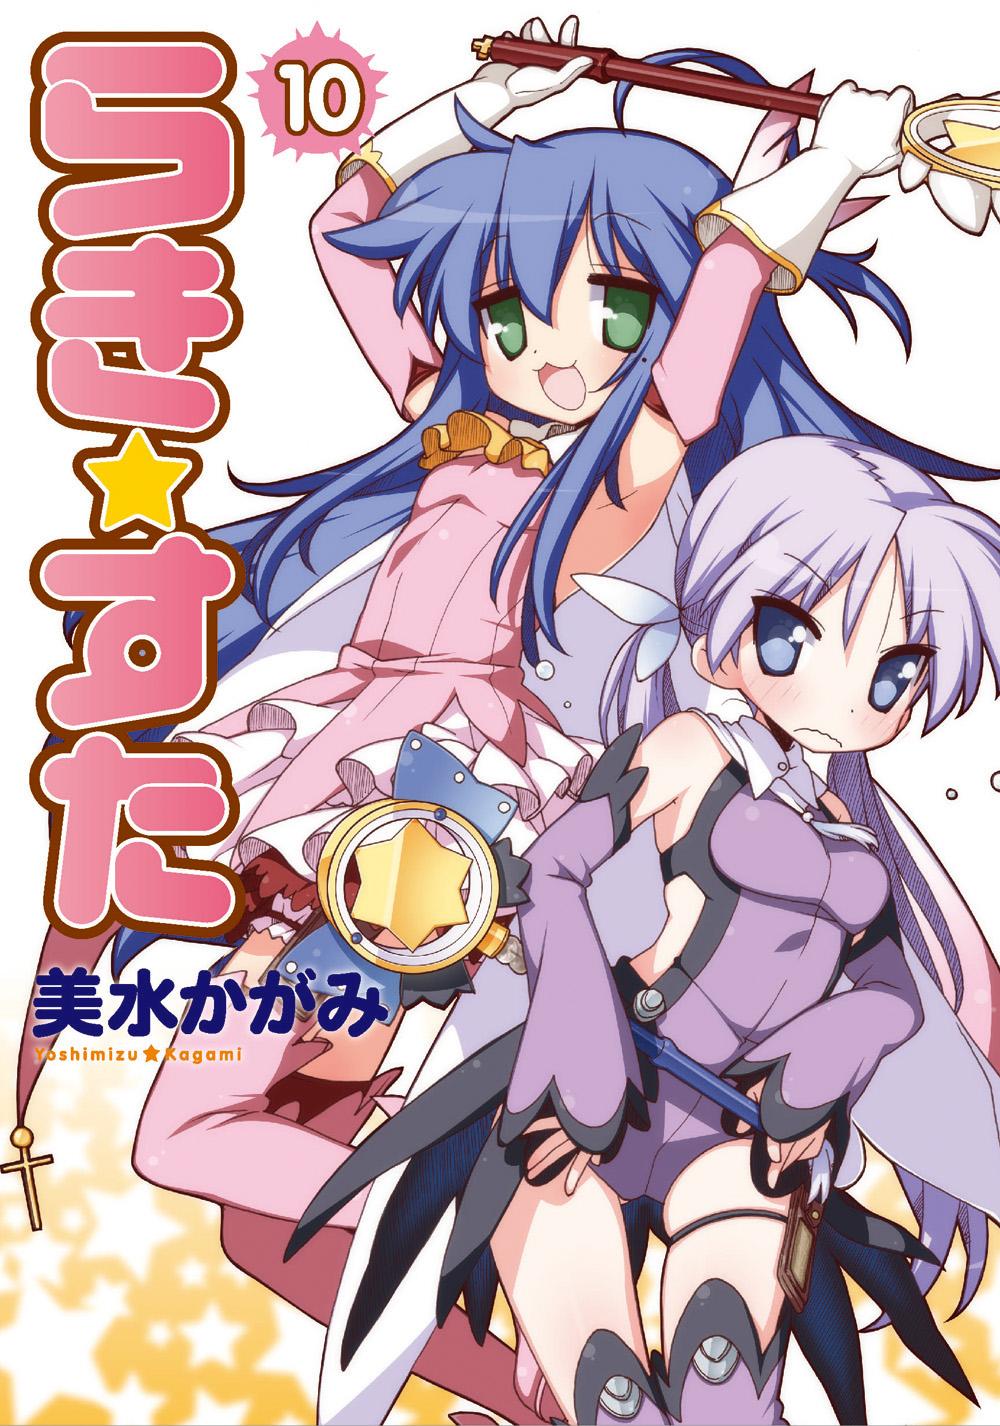 131104(3) - 漫畫《らき☆すた》(幸運星)歡慶10歲、單行本第十集推出『島風』『魔法少女伊莉雅』限定封面!